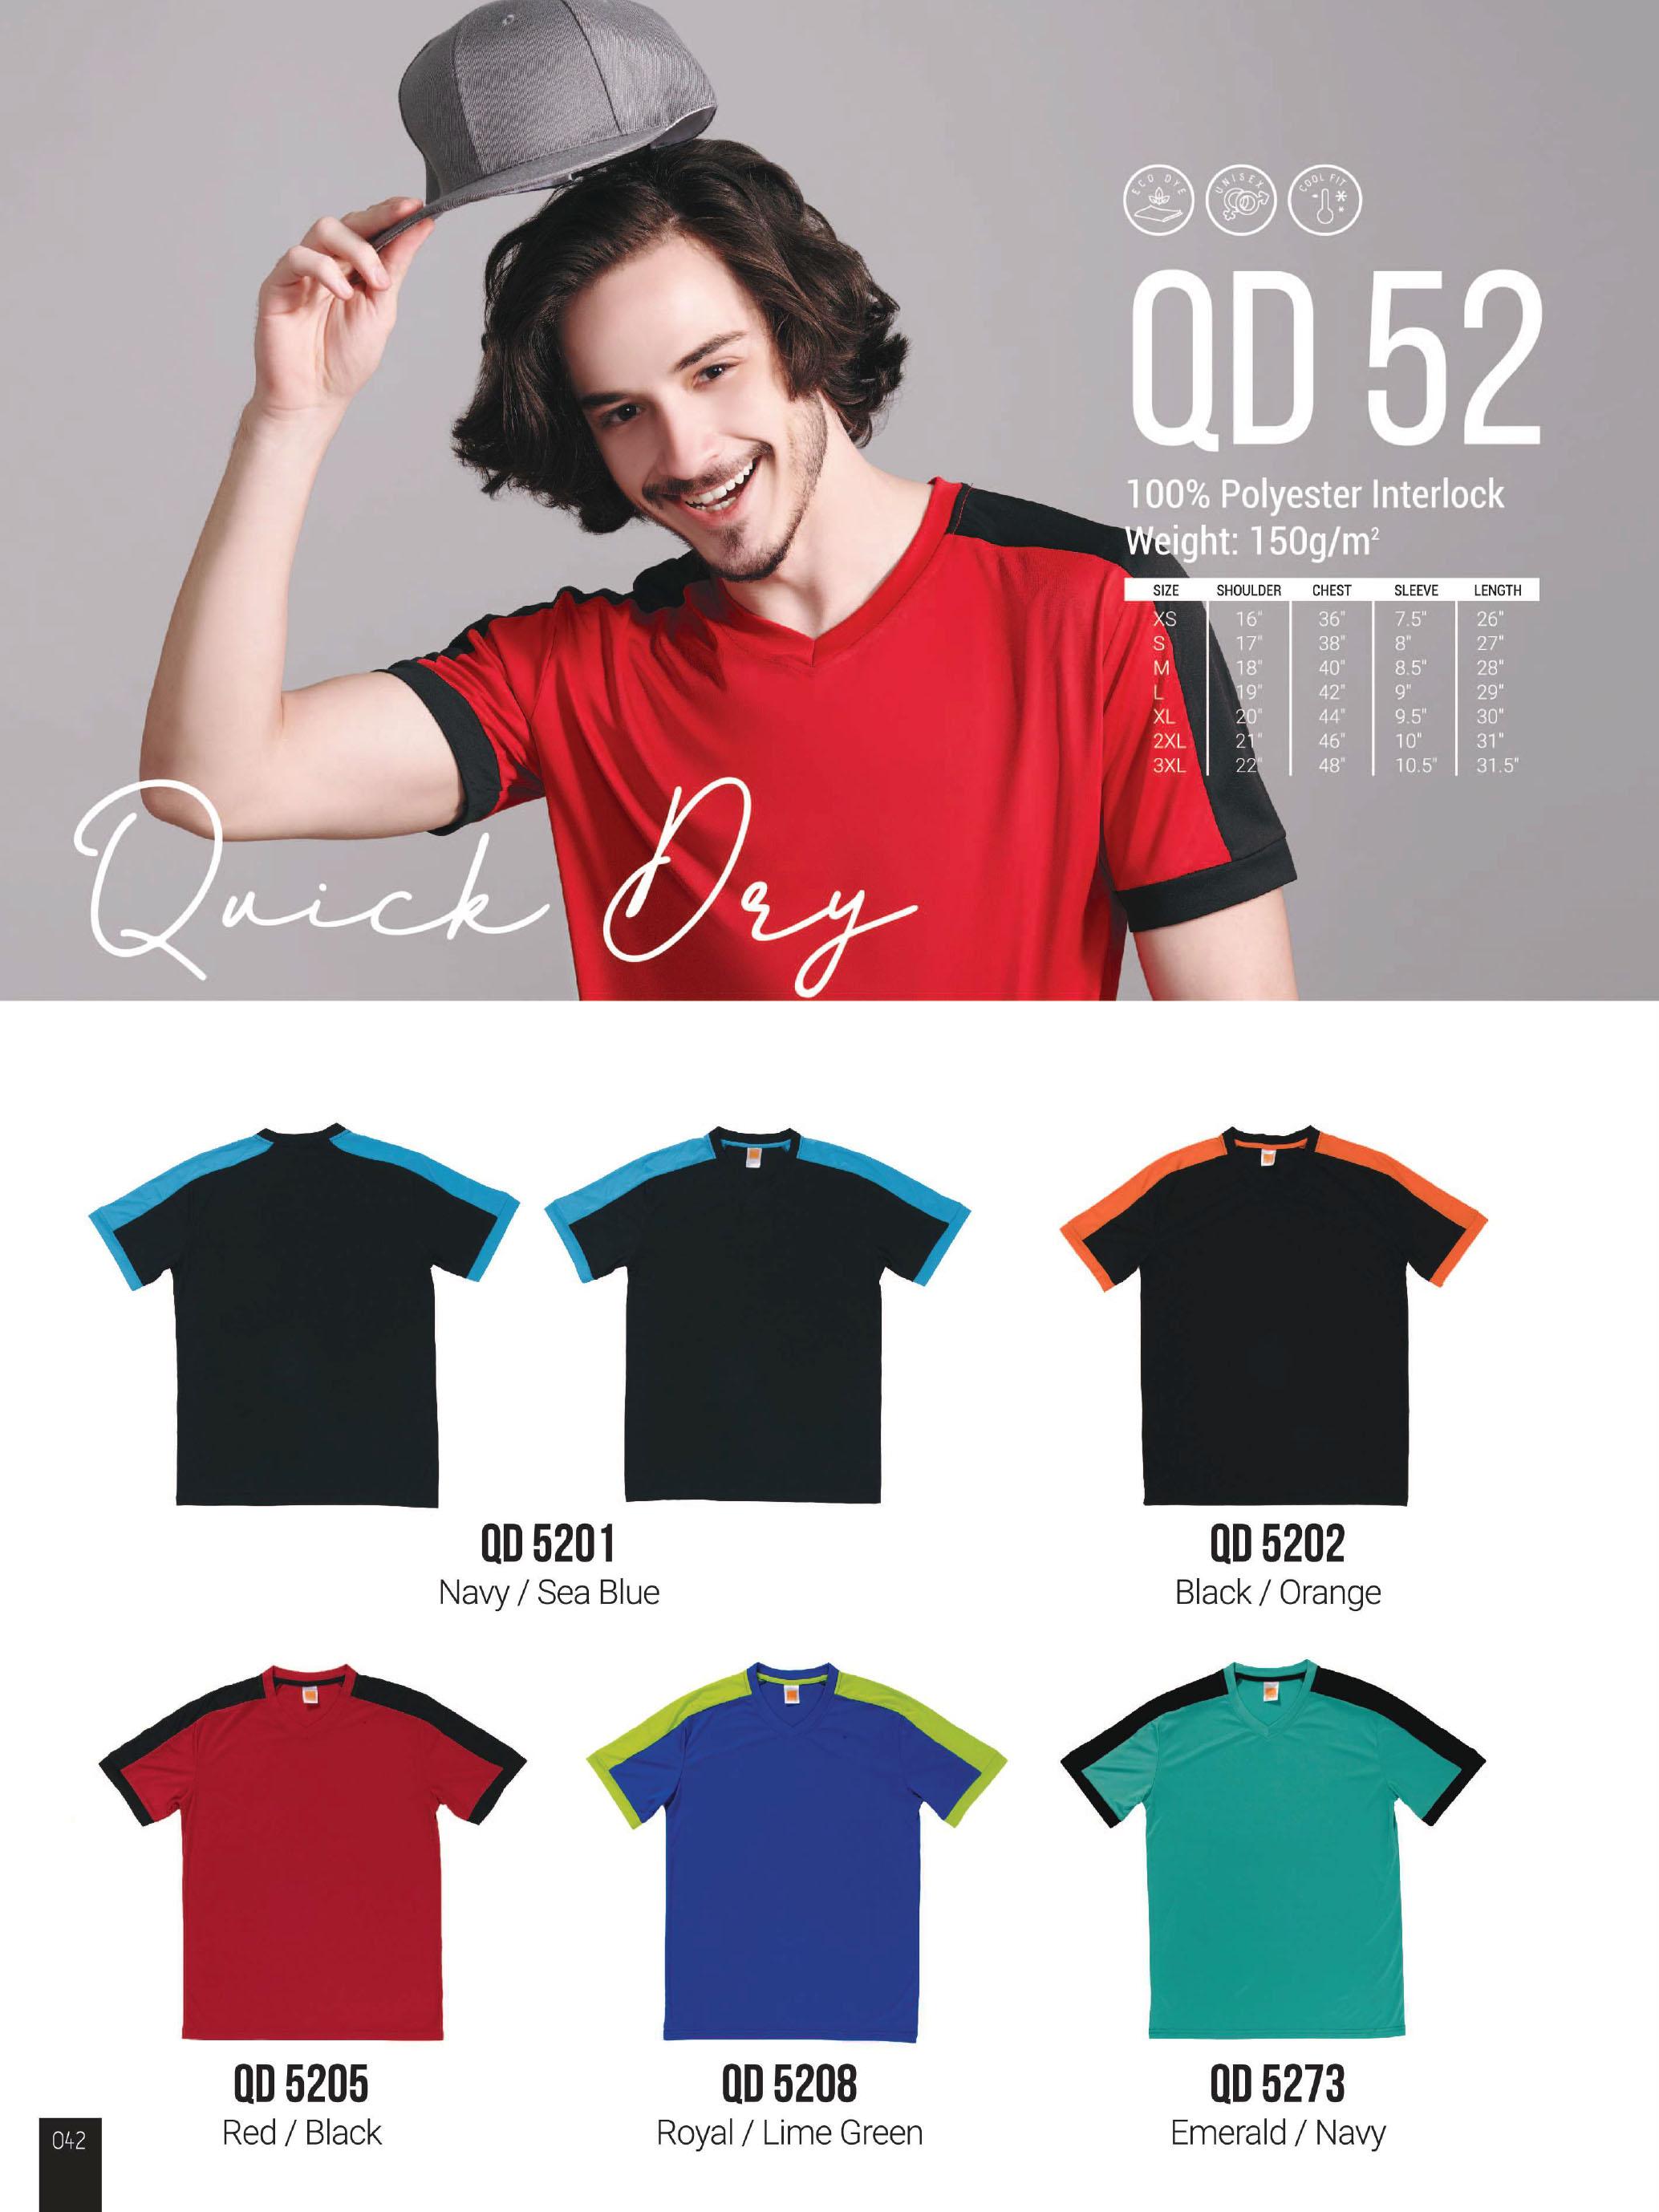 Oren Sport Catalogue 2021-44-QuickDry